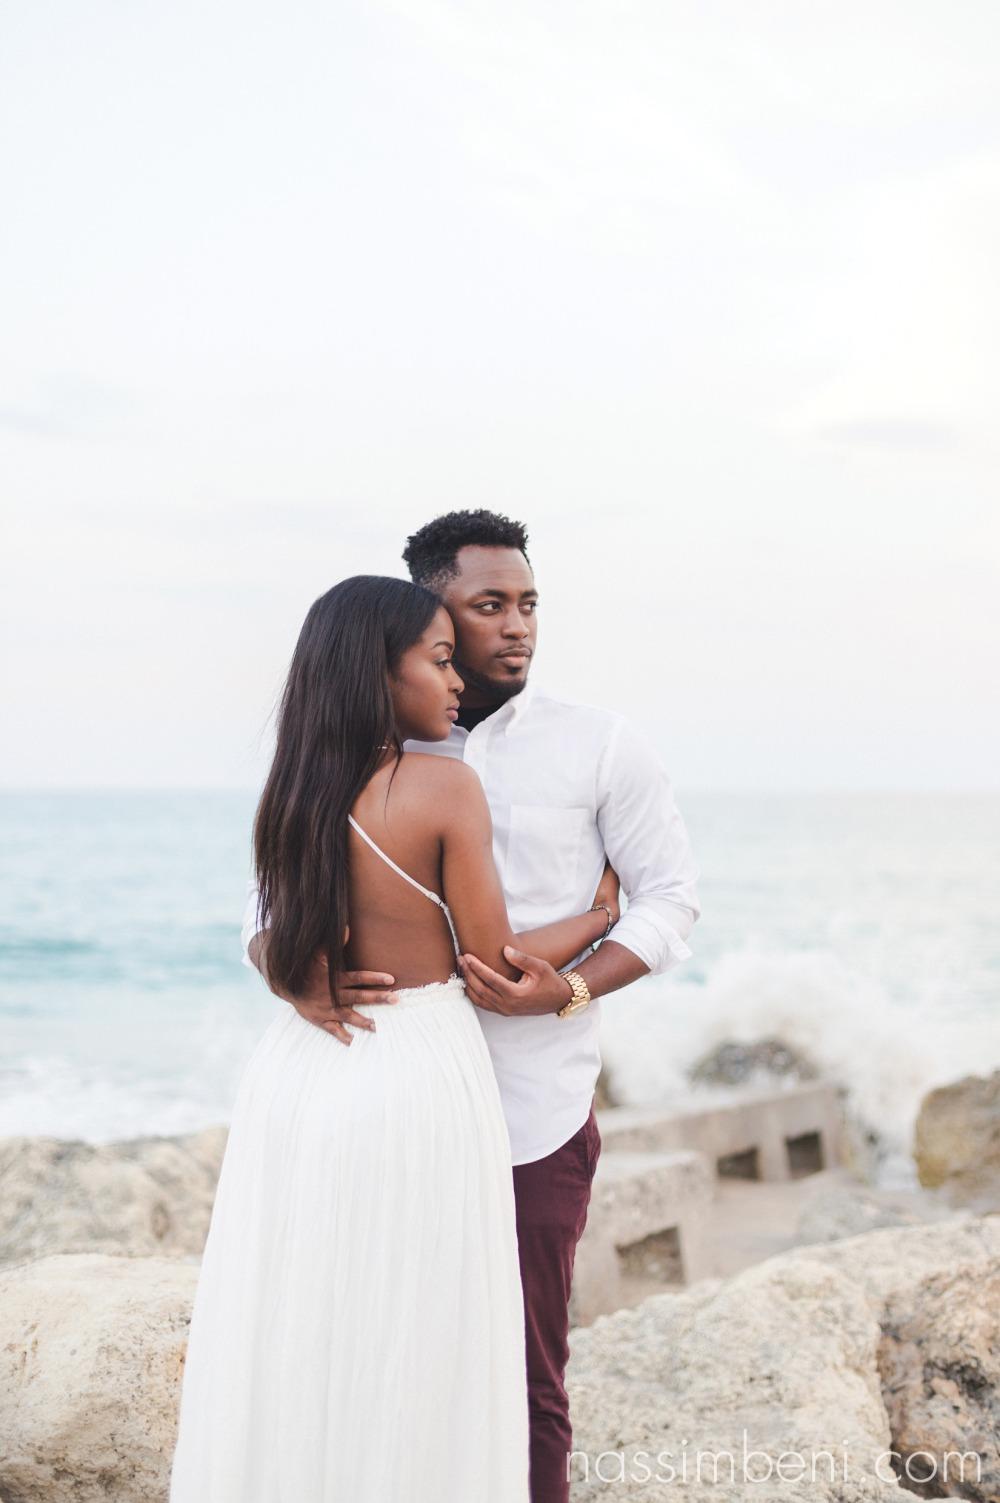 sweet embrace near worth avenue engagement session by nassimbeni photography